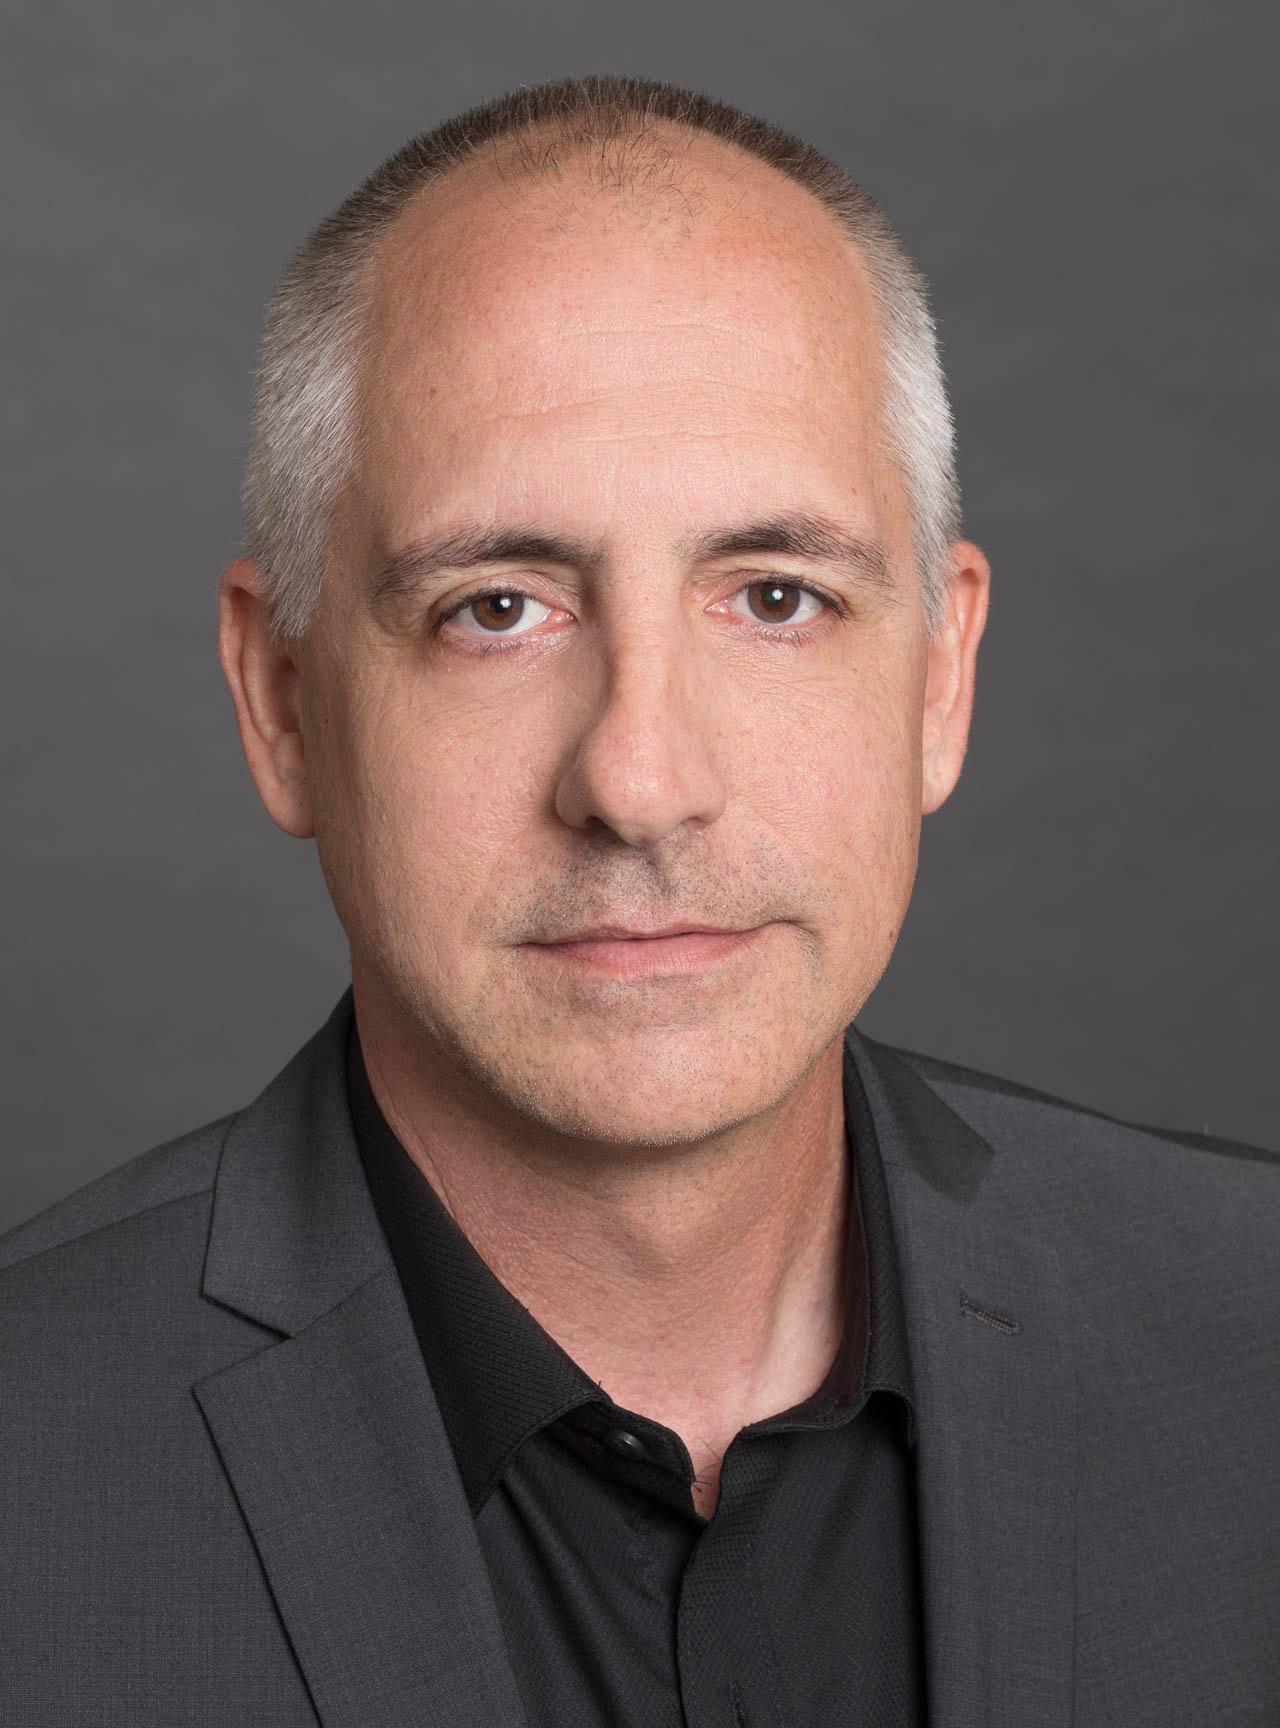 Joe Pacella